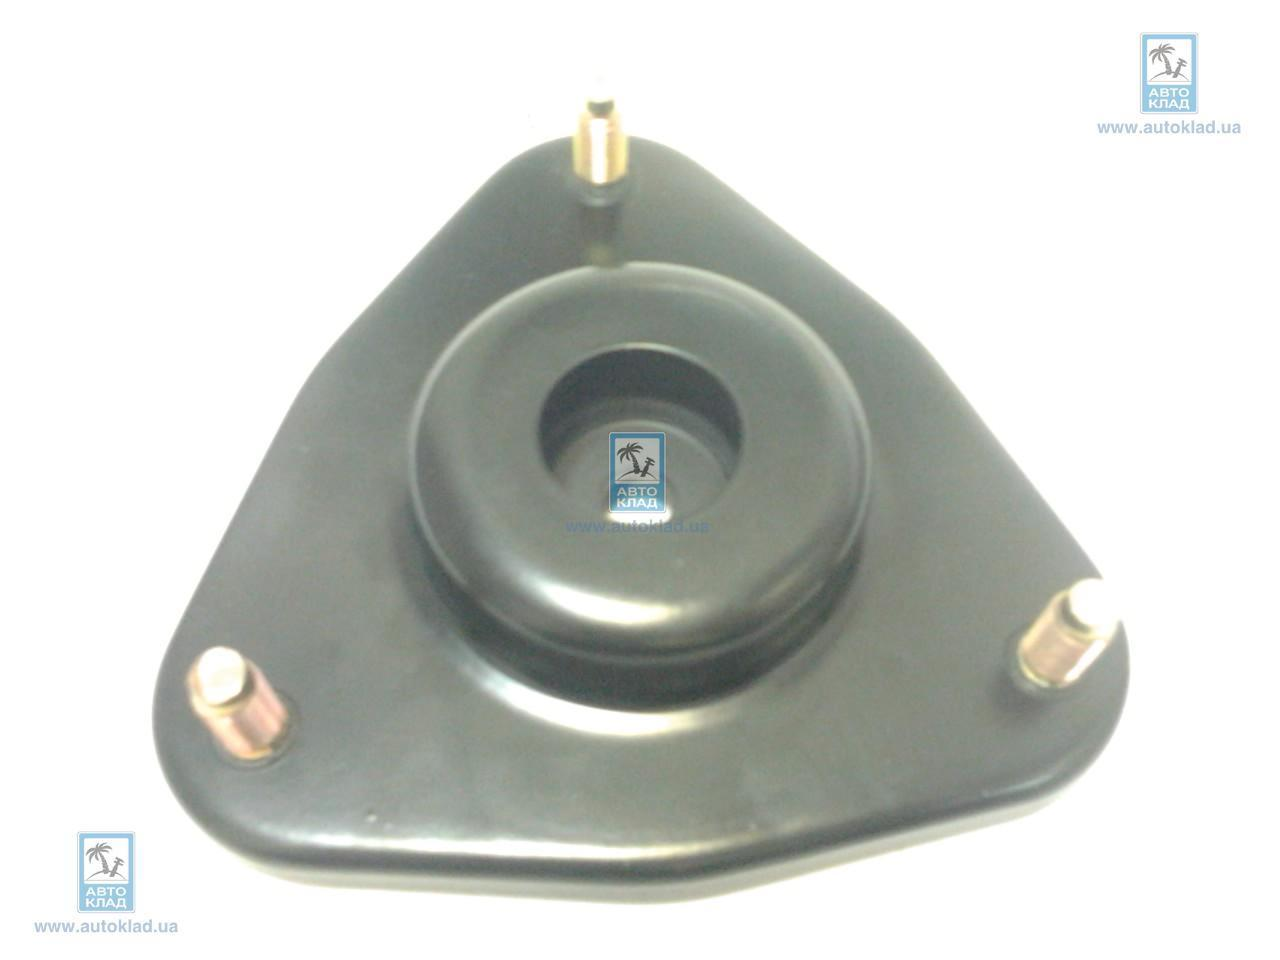 Опора амортизатора RBI M13CS901F